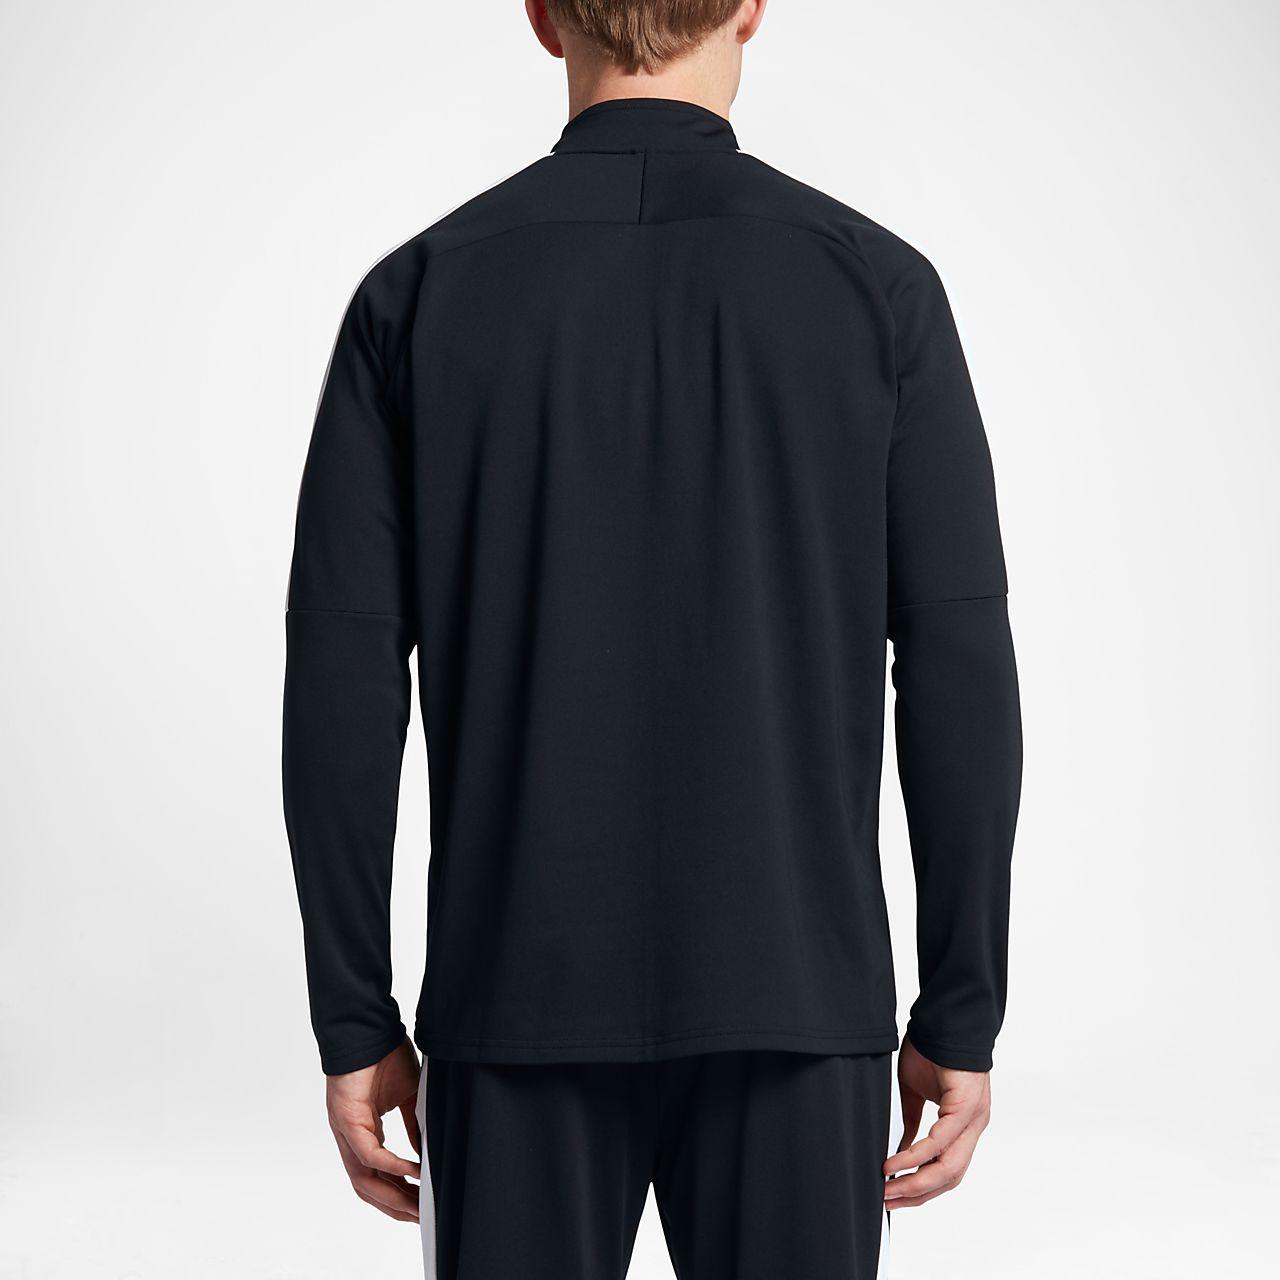 Men's Nike Squad - 1/4 Zip Long Sleeve Soccer Drill Top QL330383a